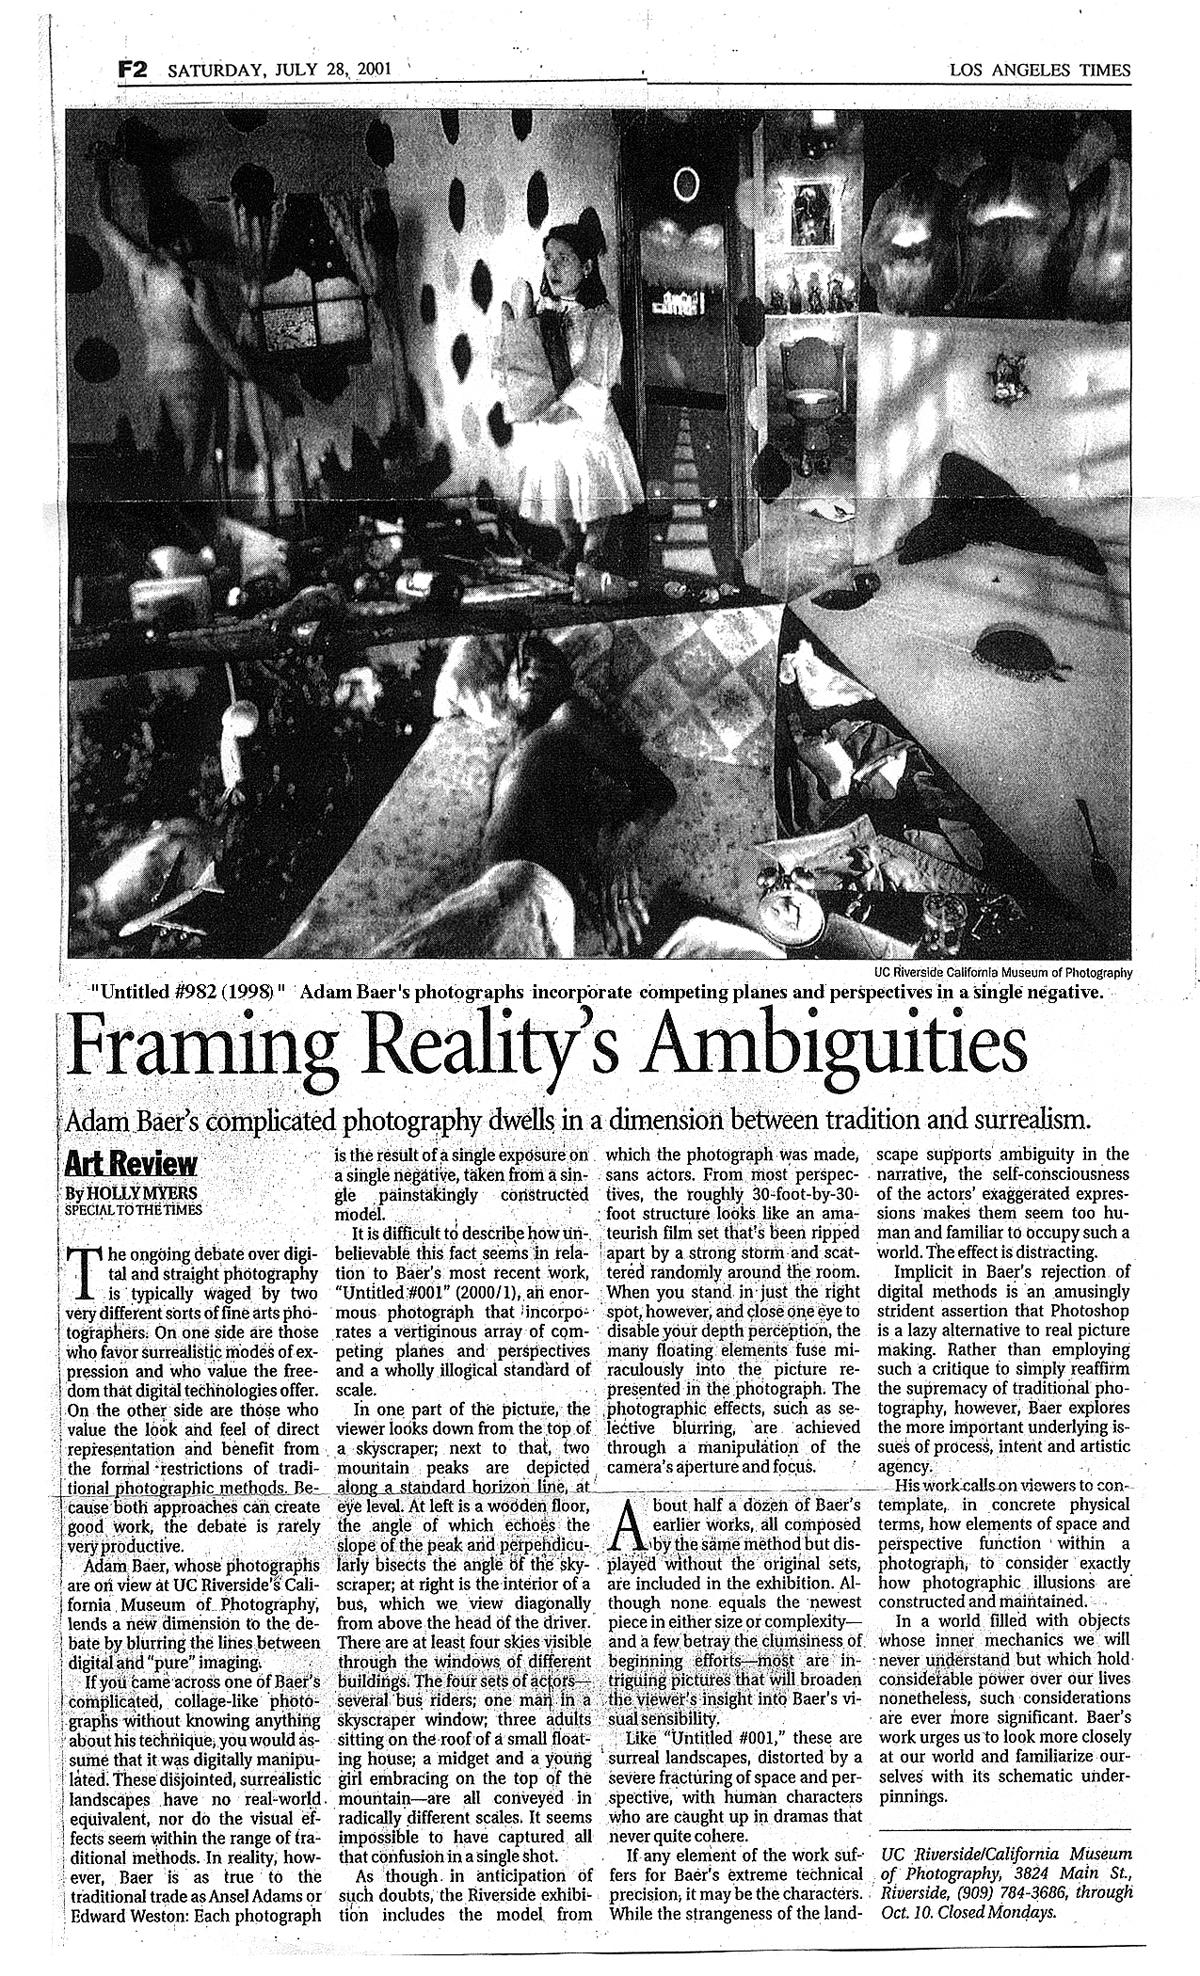 The LA Times.jpg